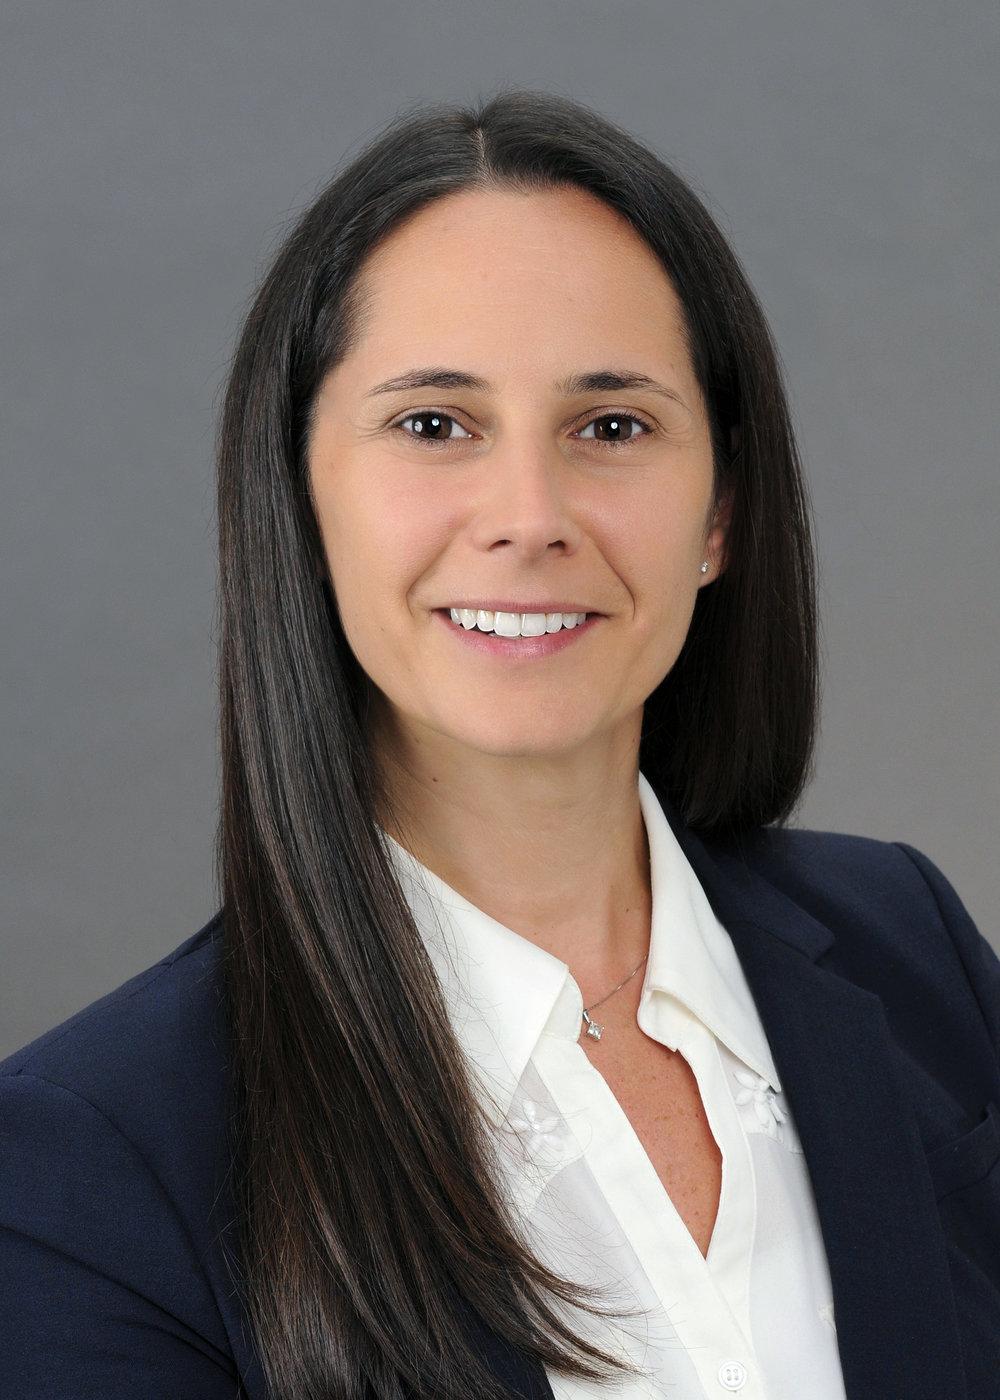 Gisselle Kelley, Advancing Women Executives Leader